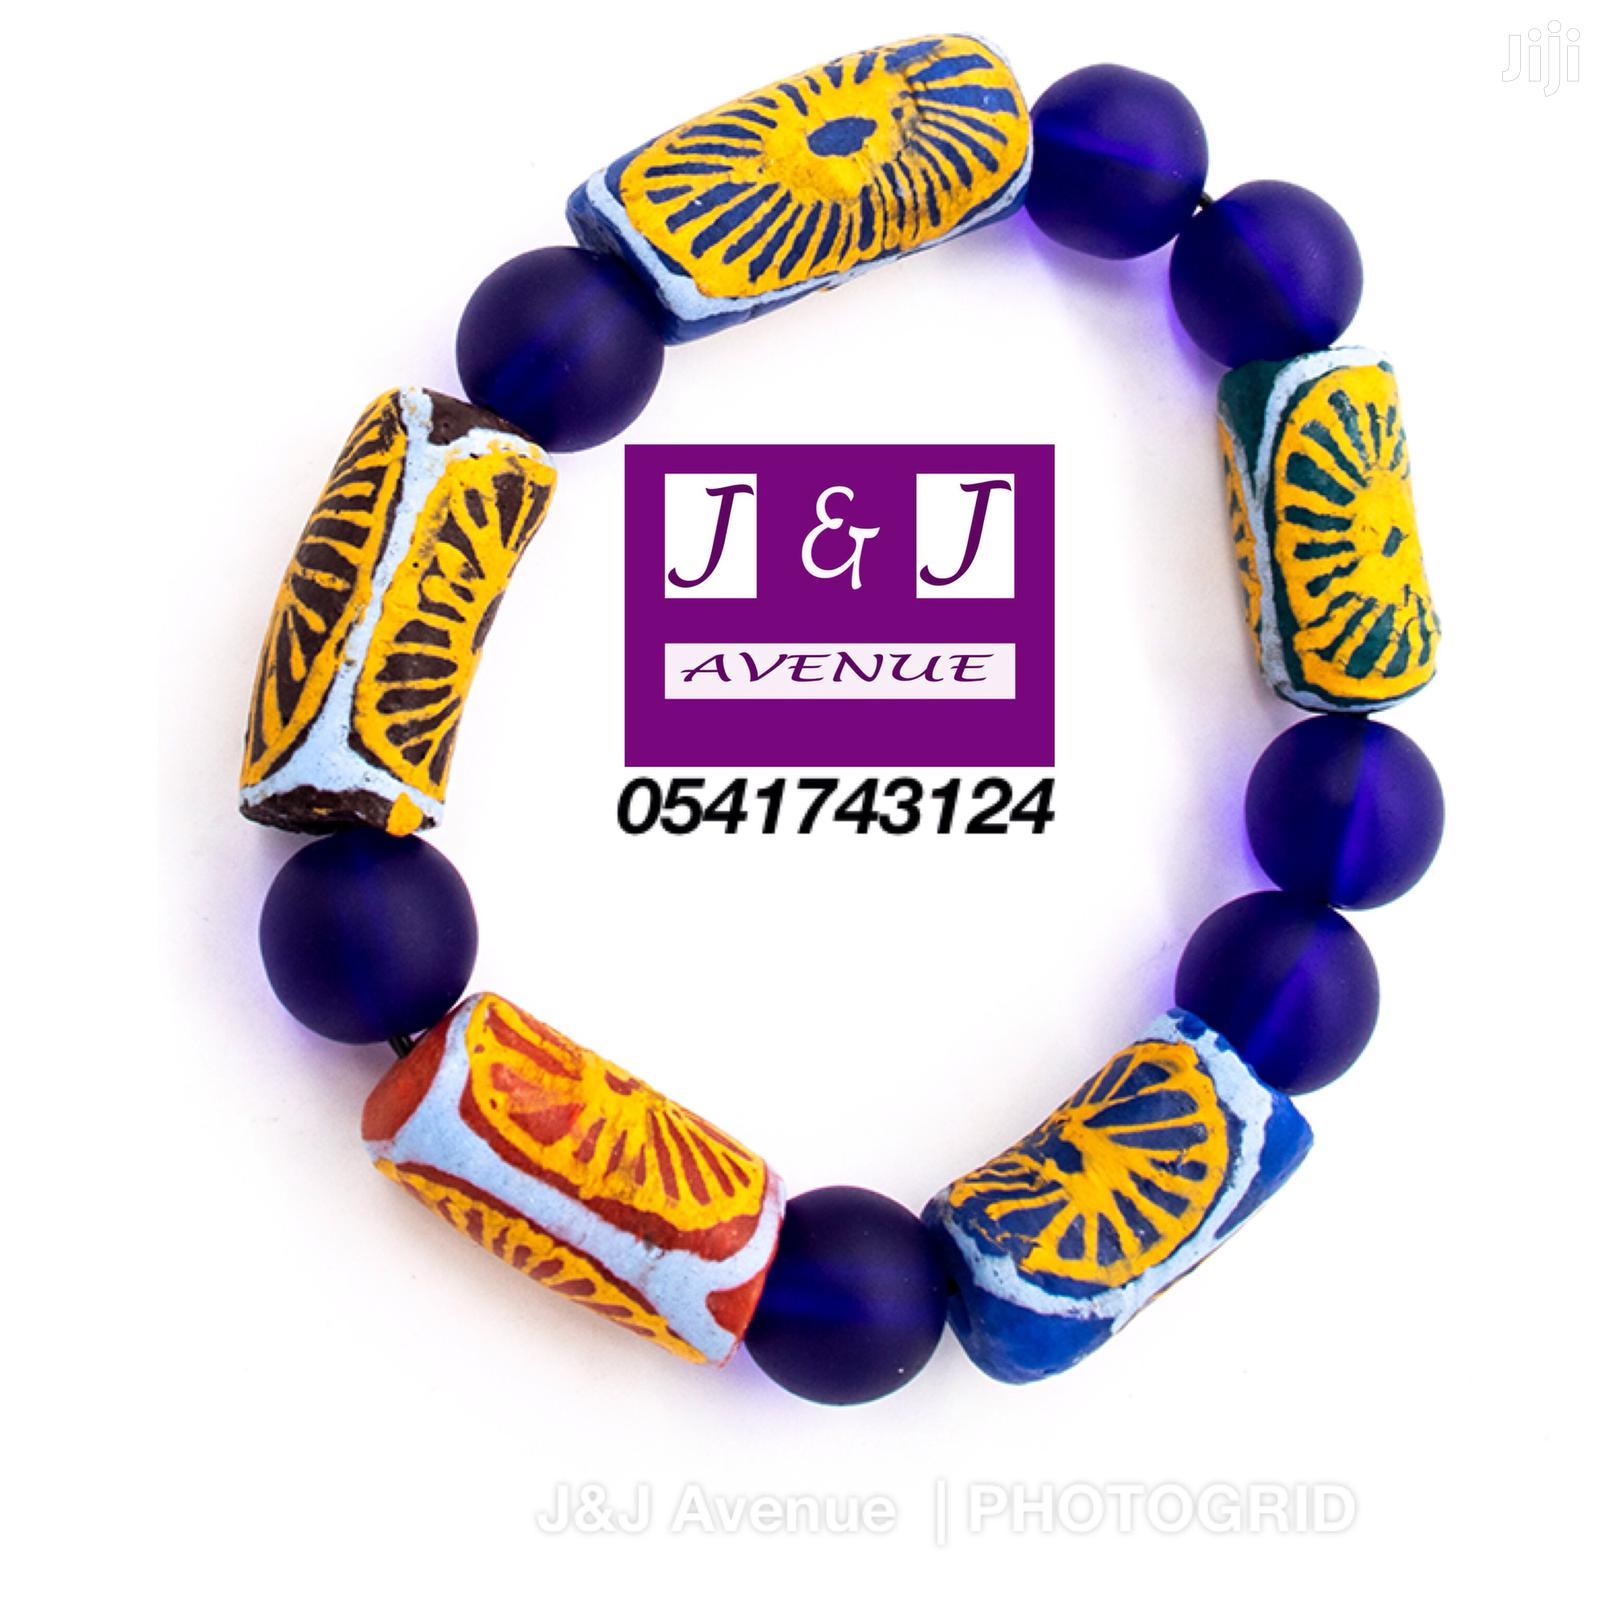 Customized Bracelet | Jewelry for sale in Labadi-Aborm, Greater Accra, Ghana